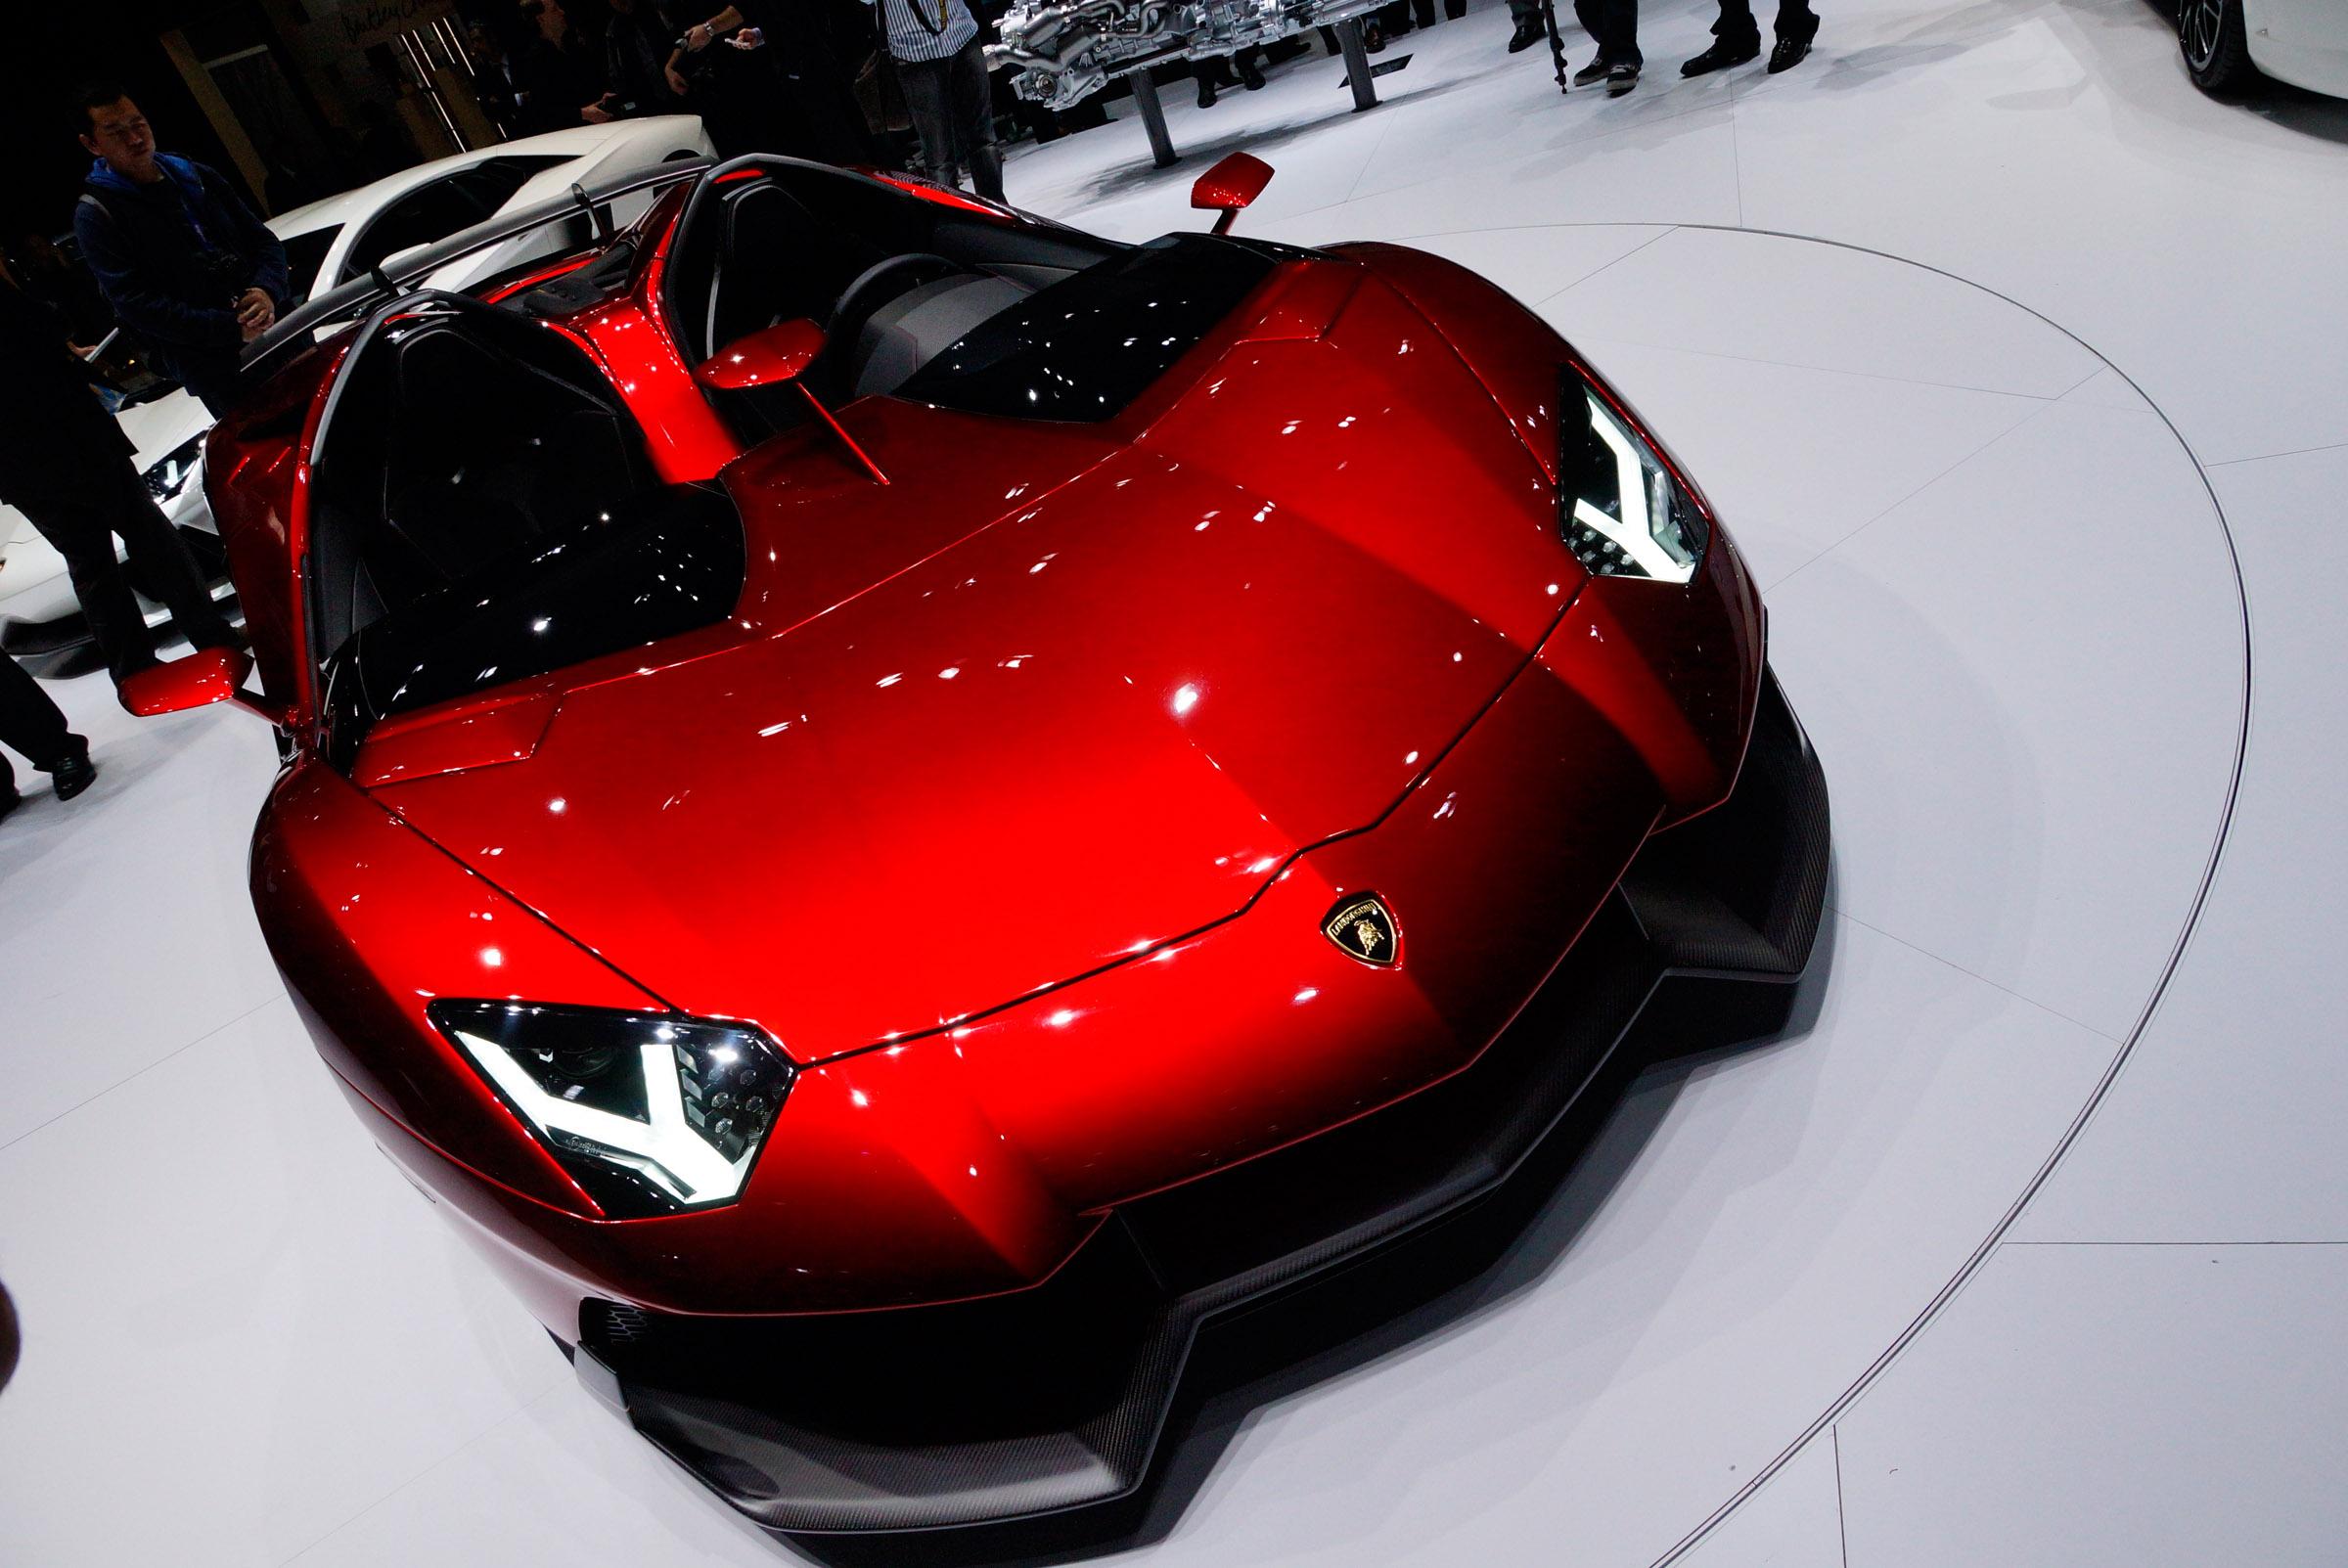 2012 Geneva Motor Show: Lamborghini Aventador J - фотография №9